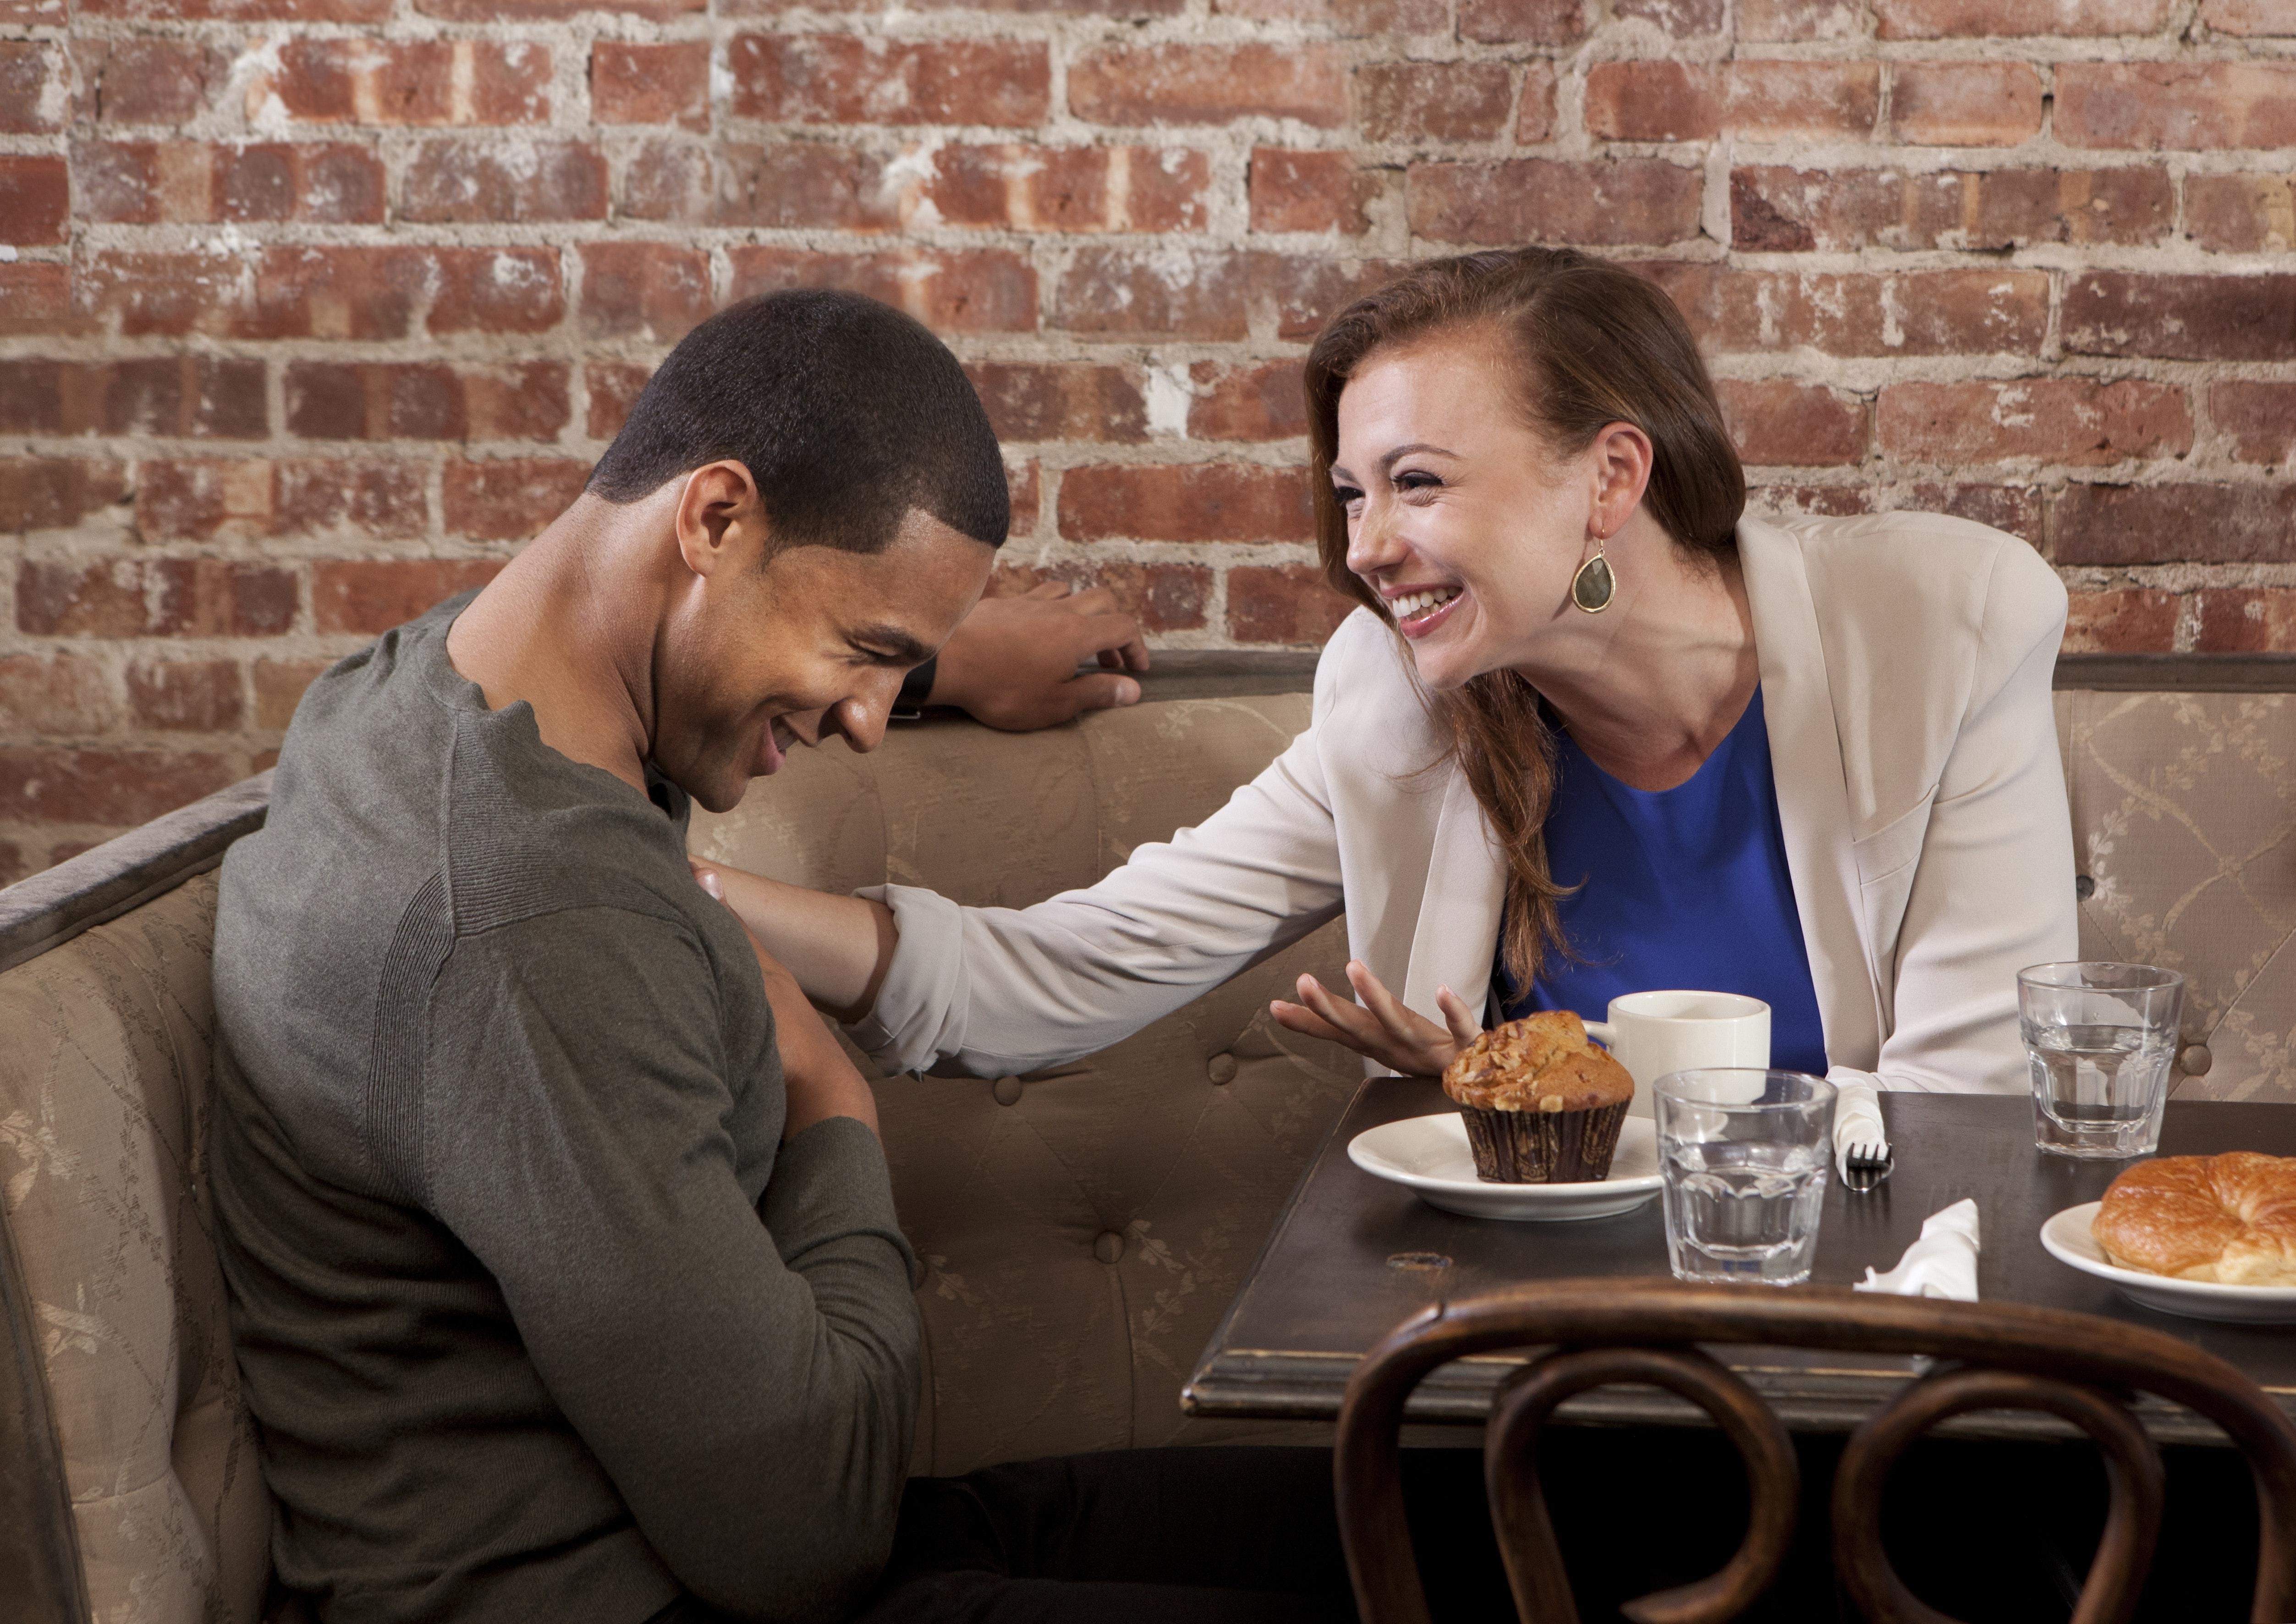 date med kjæresten dating a woman